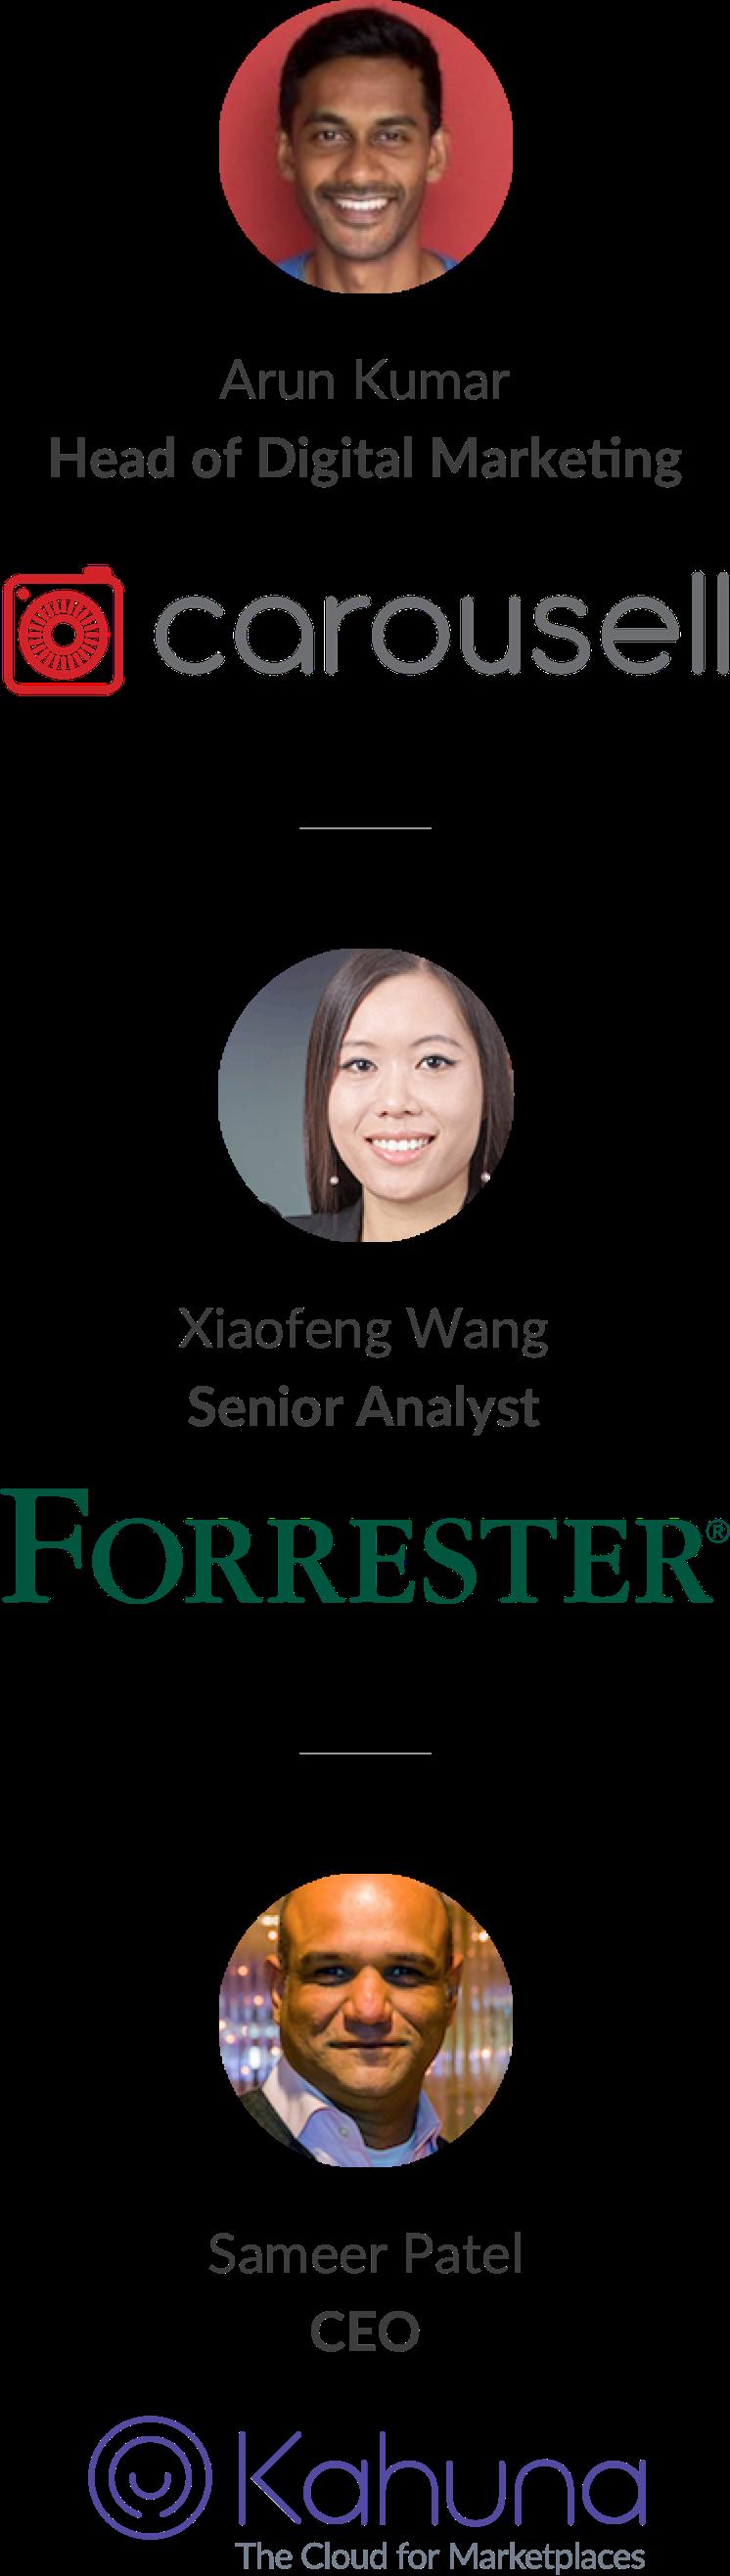 MarketplaceConnect Singapore 2018 panel